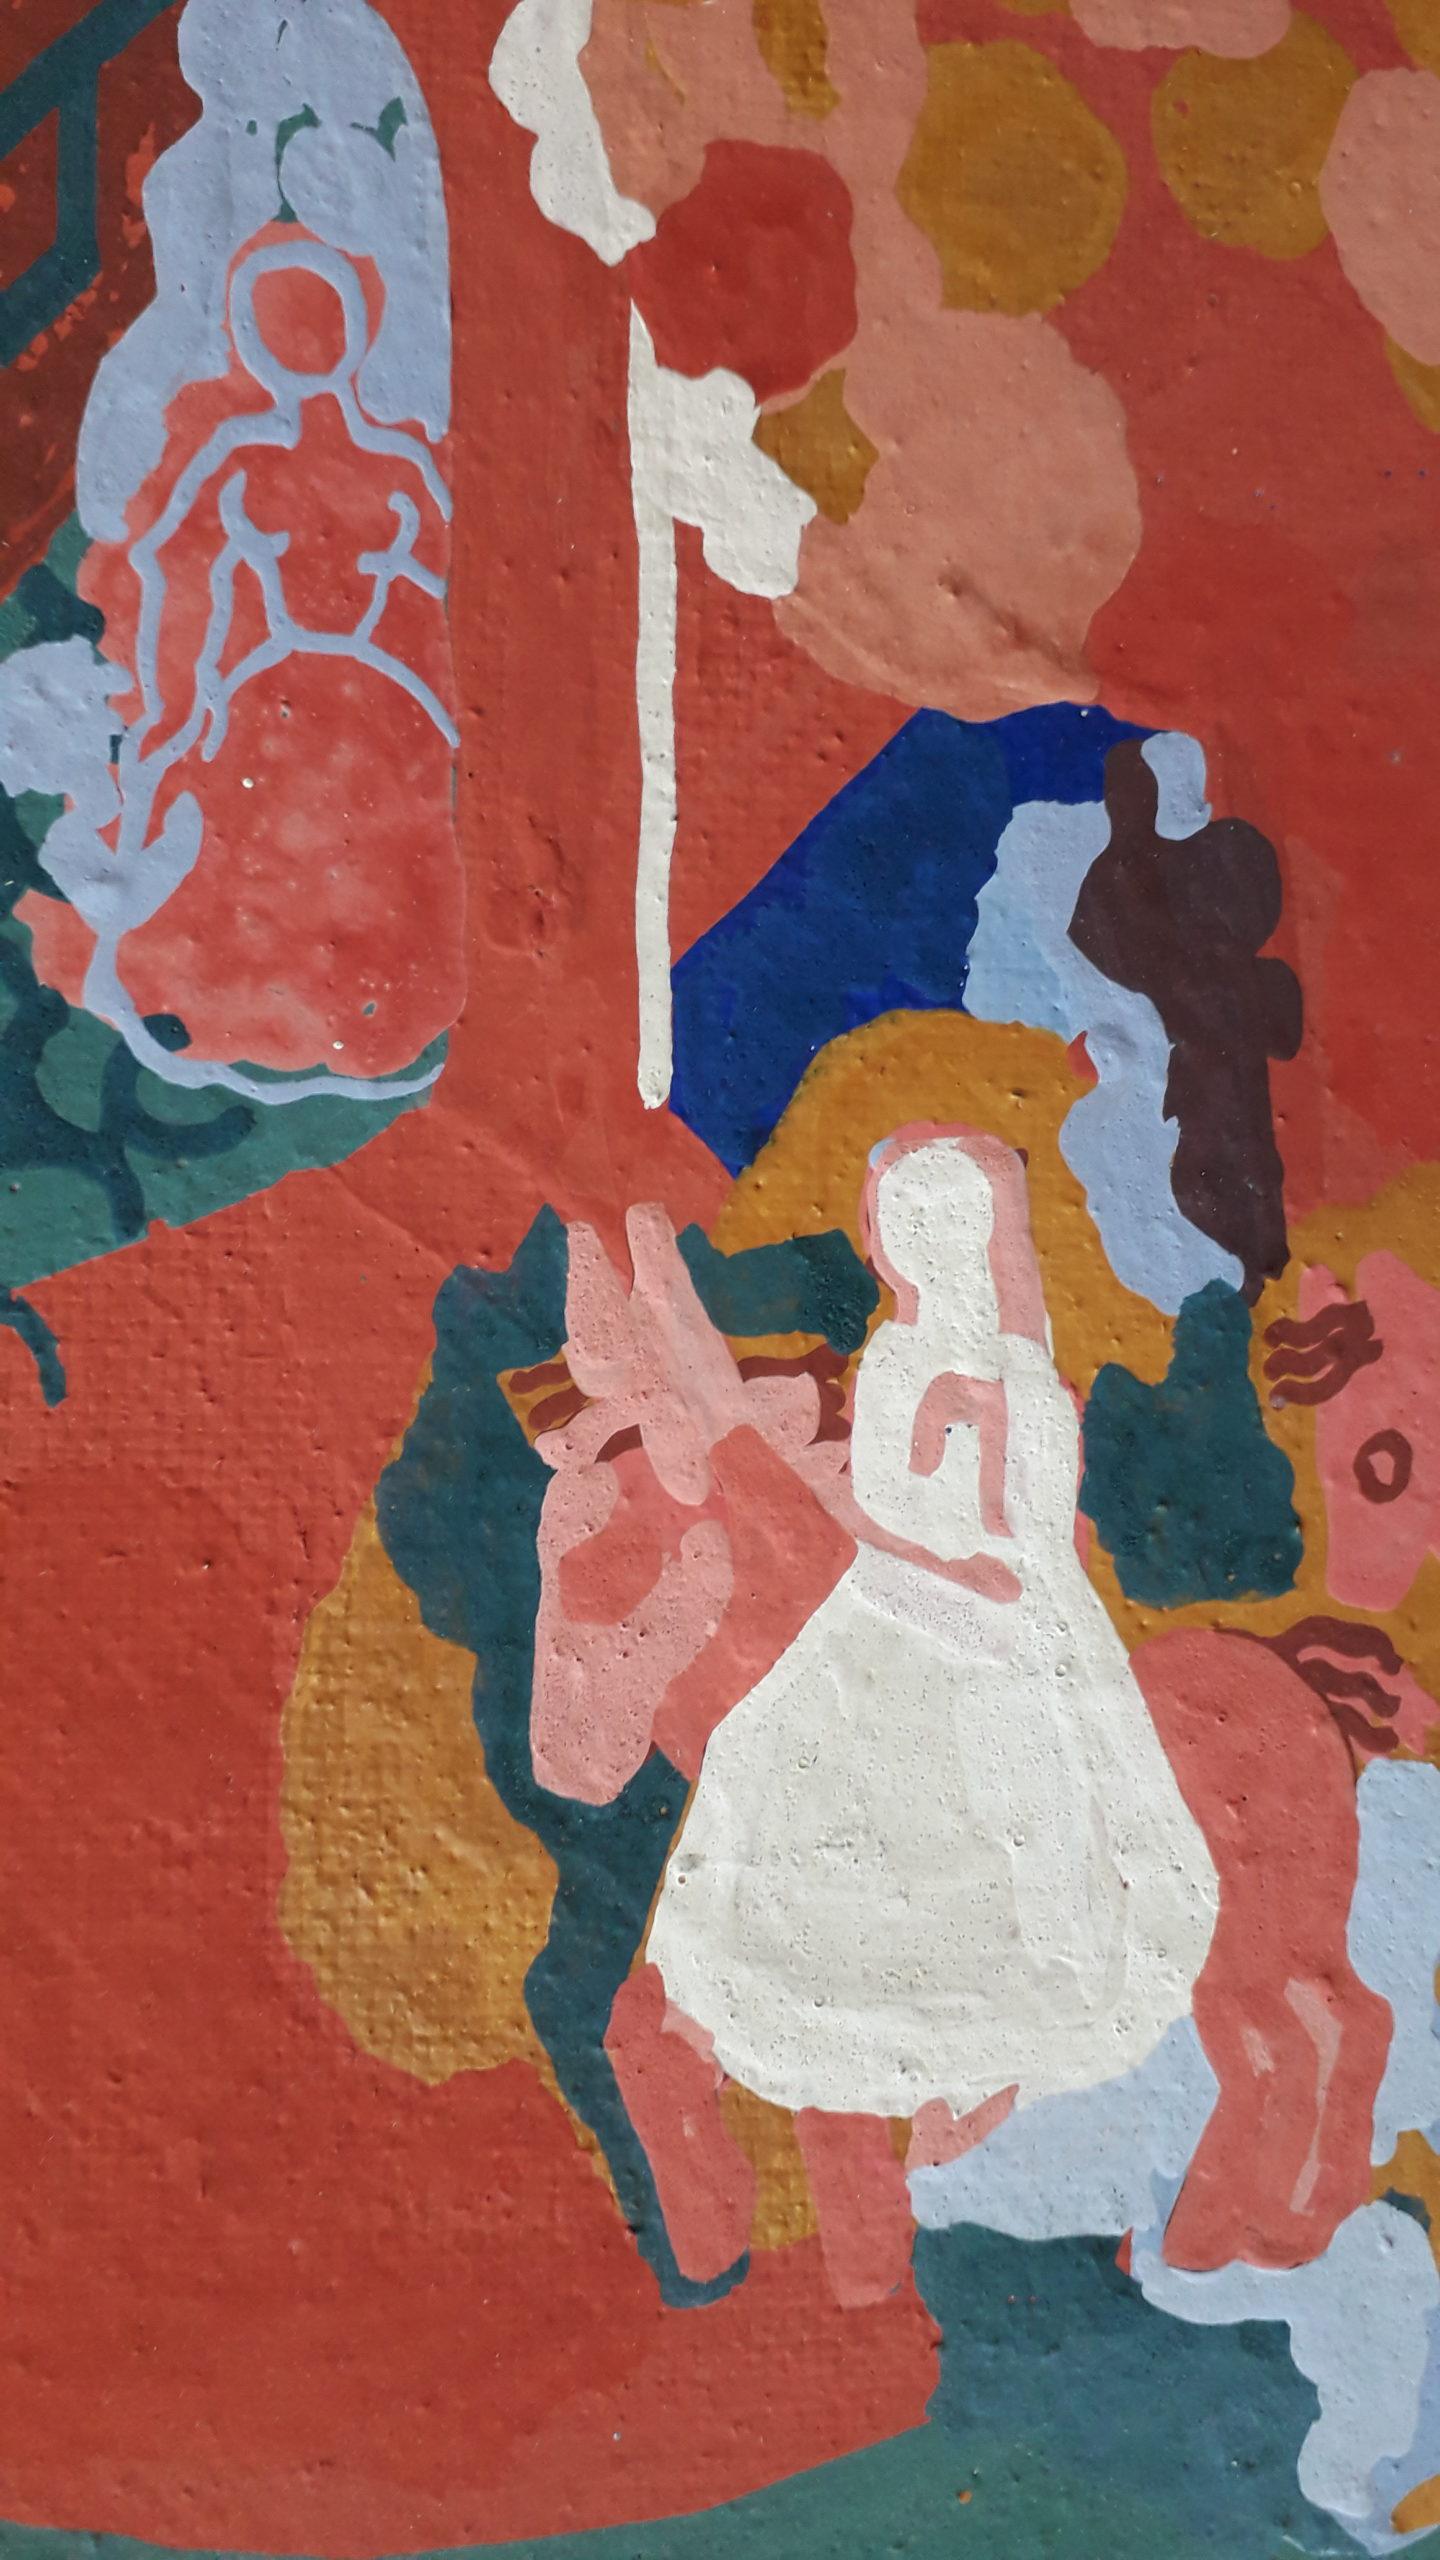 Gerard-maud-entree-jesus-dans-jerusalem-focus